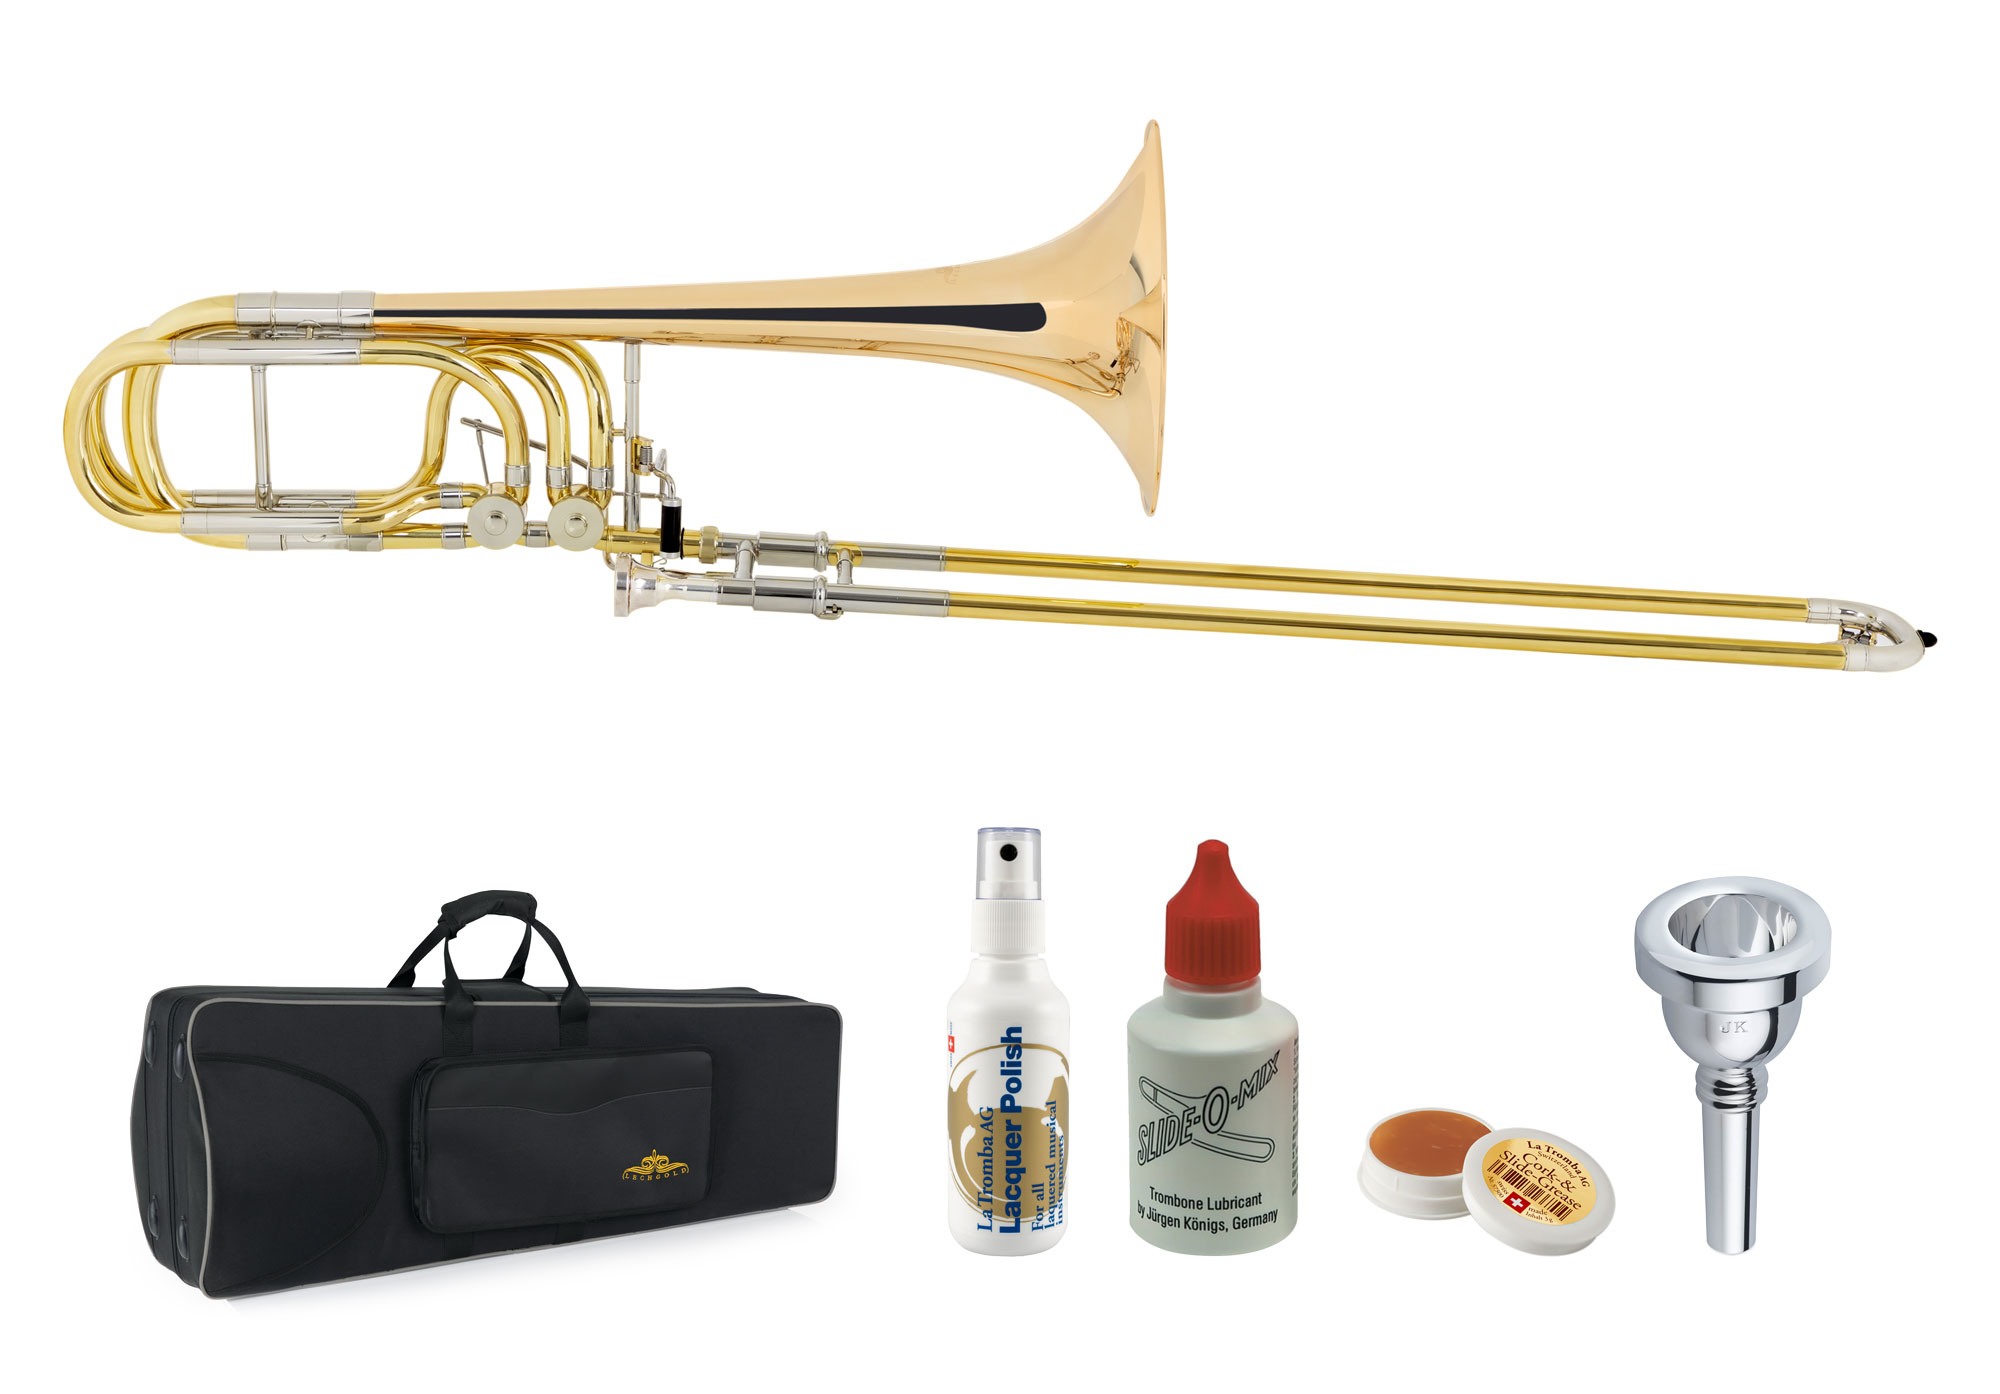 Posaunen - Lechgold BP 18GL Bassposaune Goldmessing Deluxe Set - Onlineshop Musikhaus Kirstein